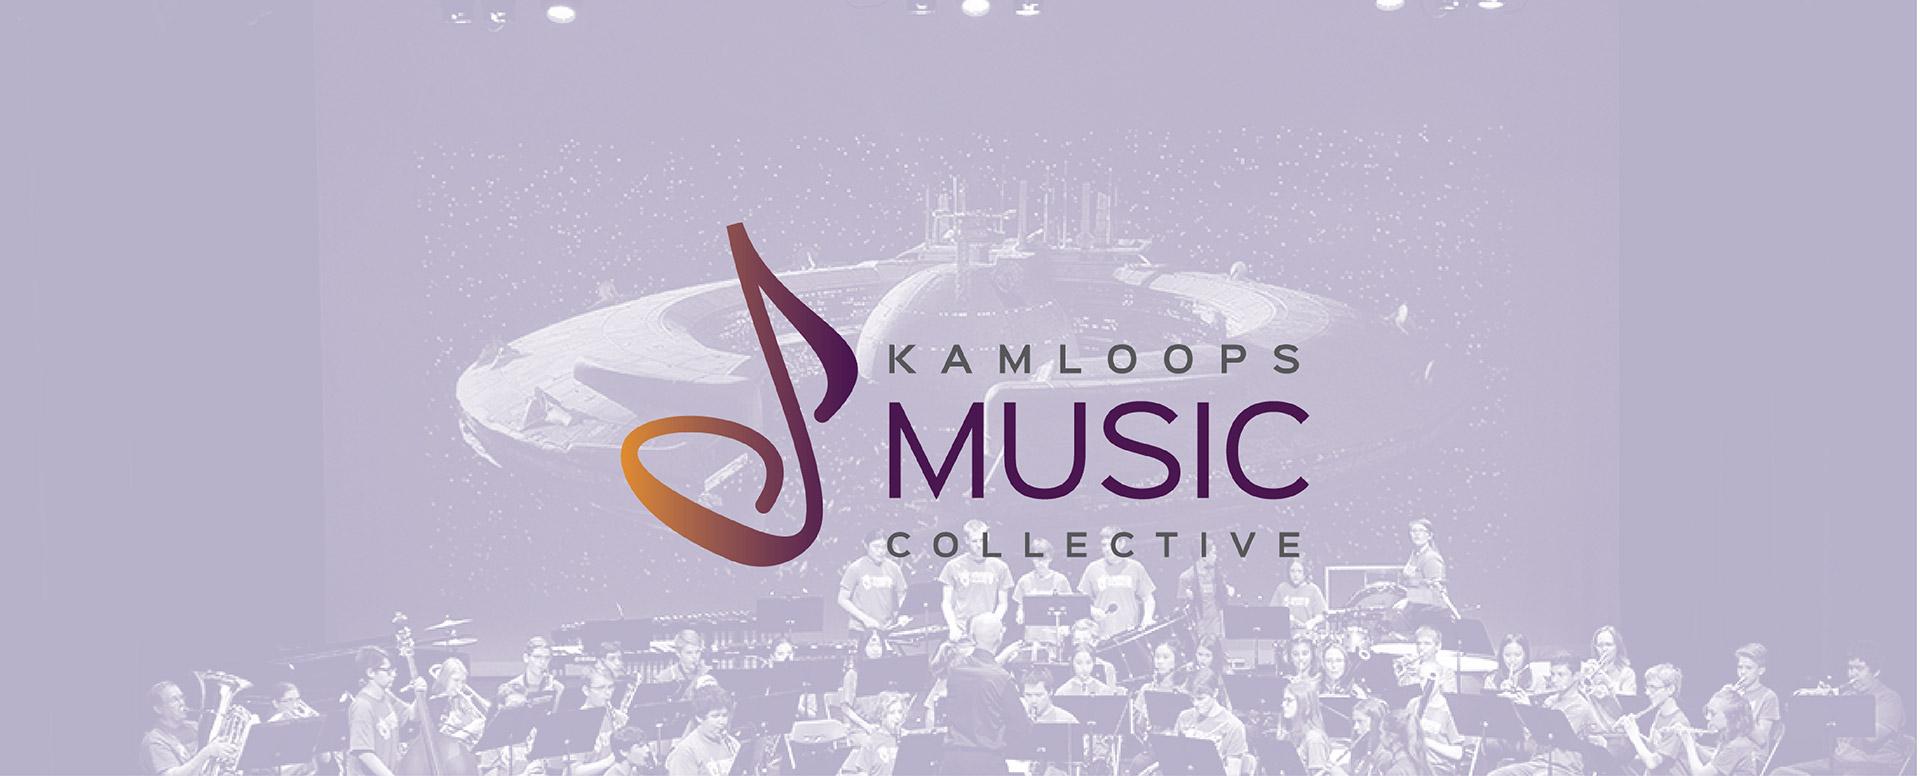 Social Enterprise Profile: Kamloops Music Collective